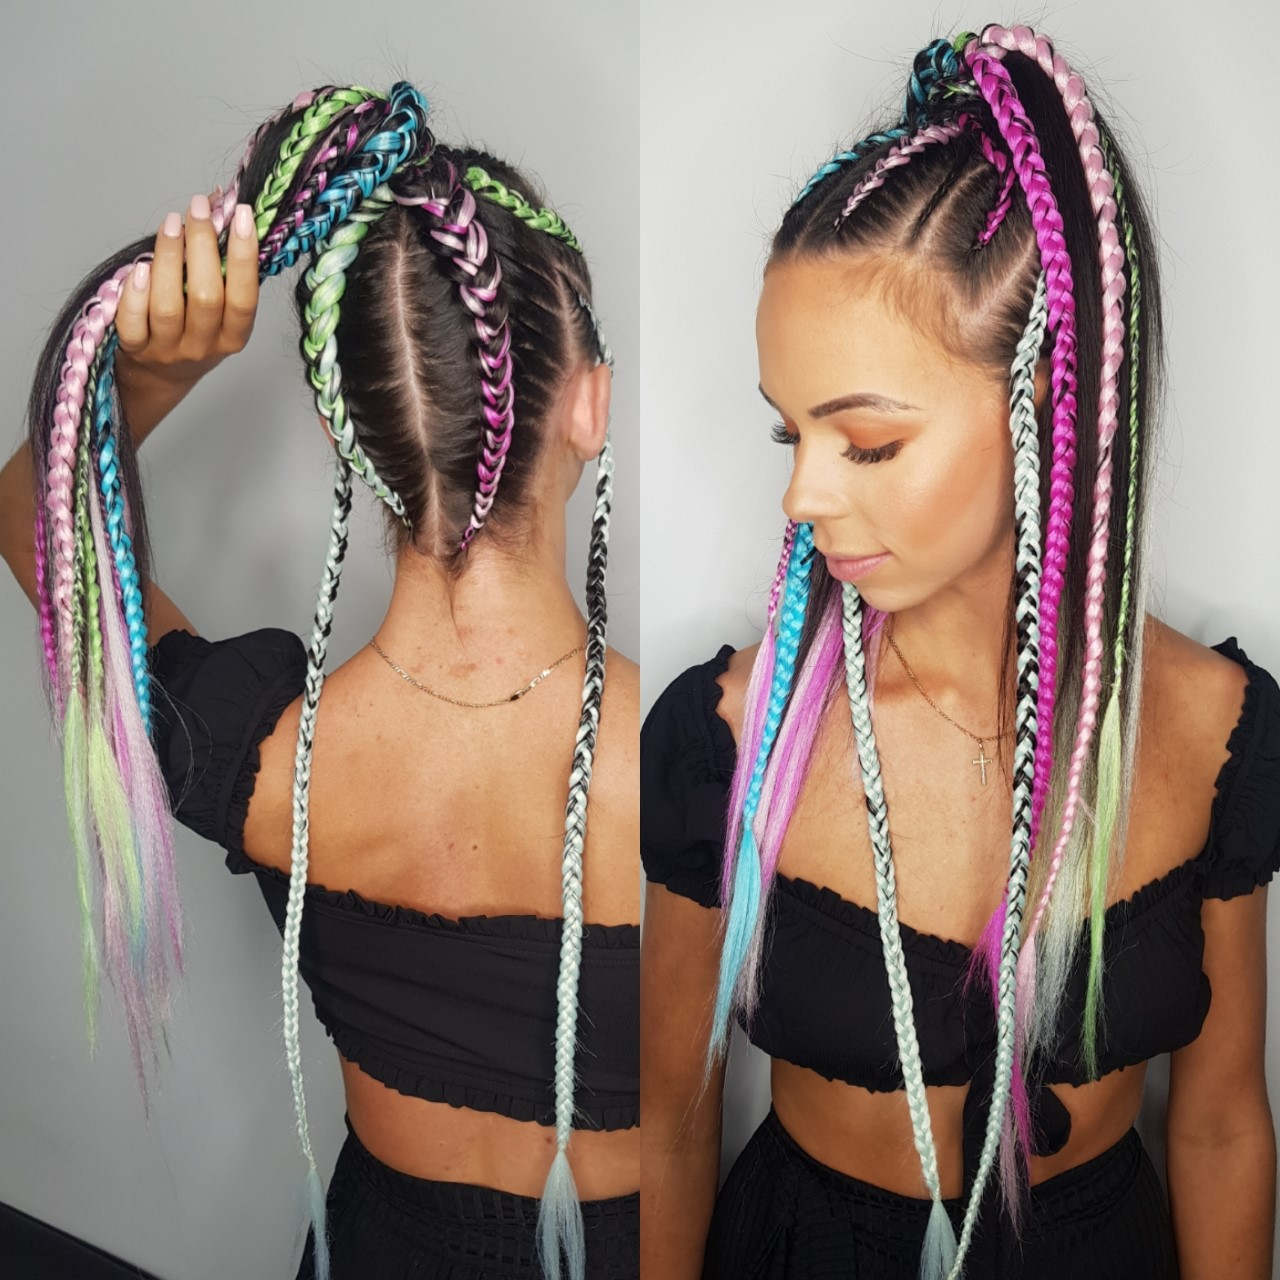 9-12 Braids Ponytail Style